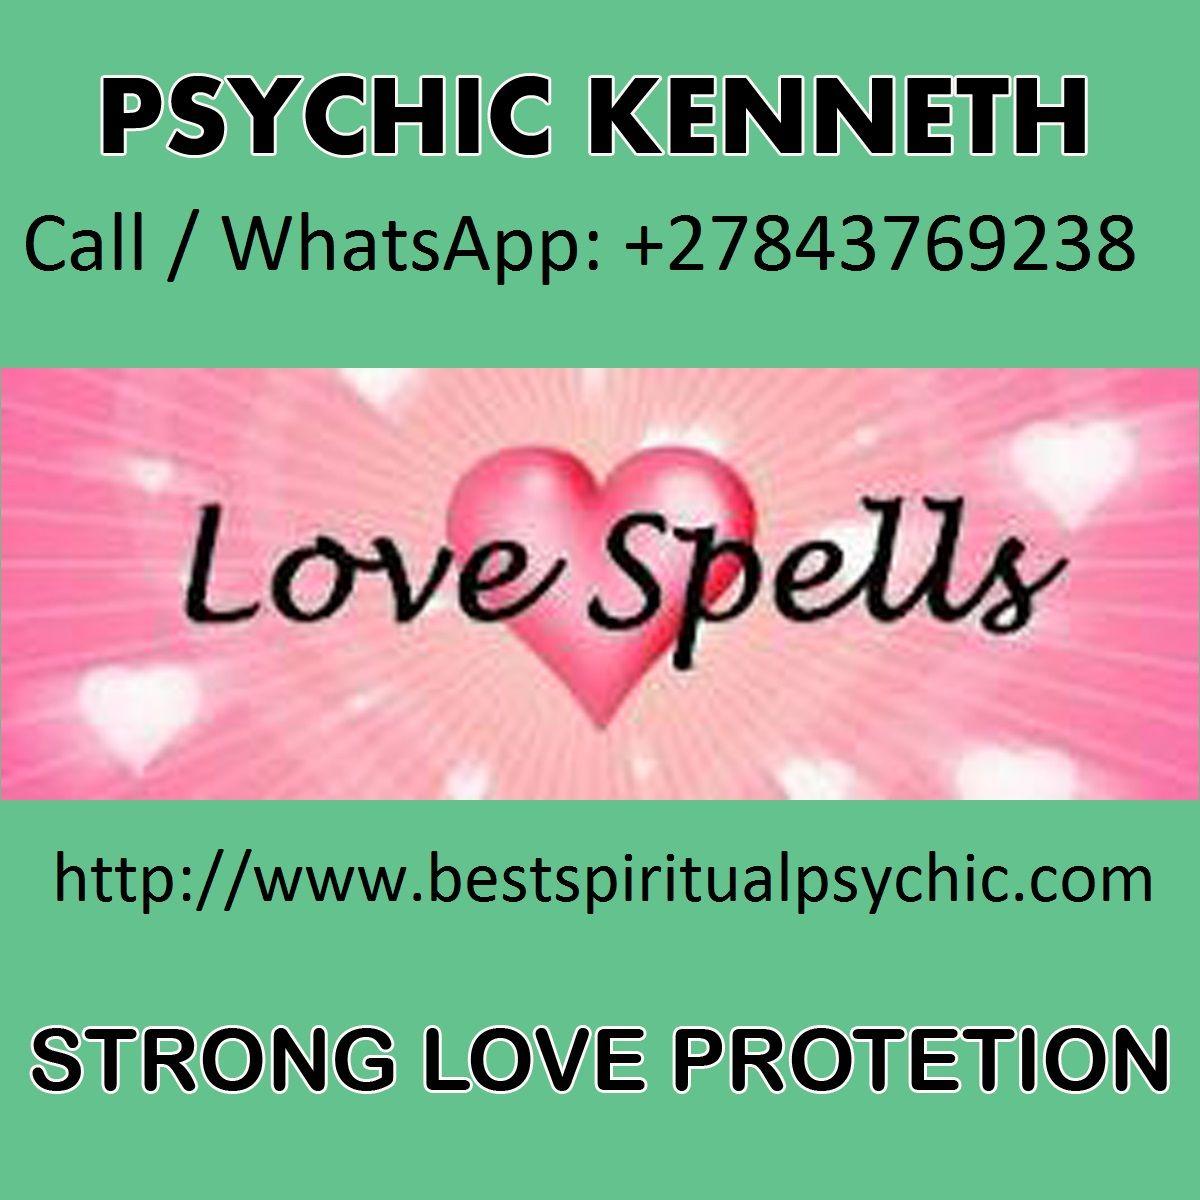 Powerful Global Social Network Spiritualist Psychic Healer, Spell